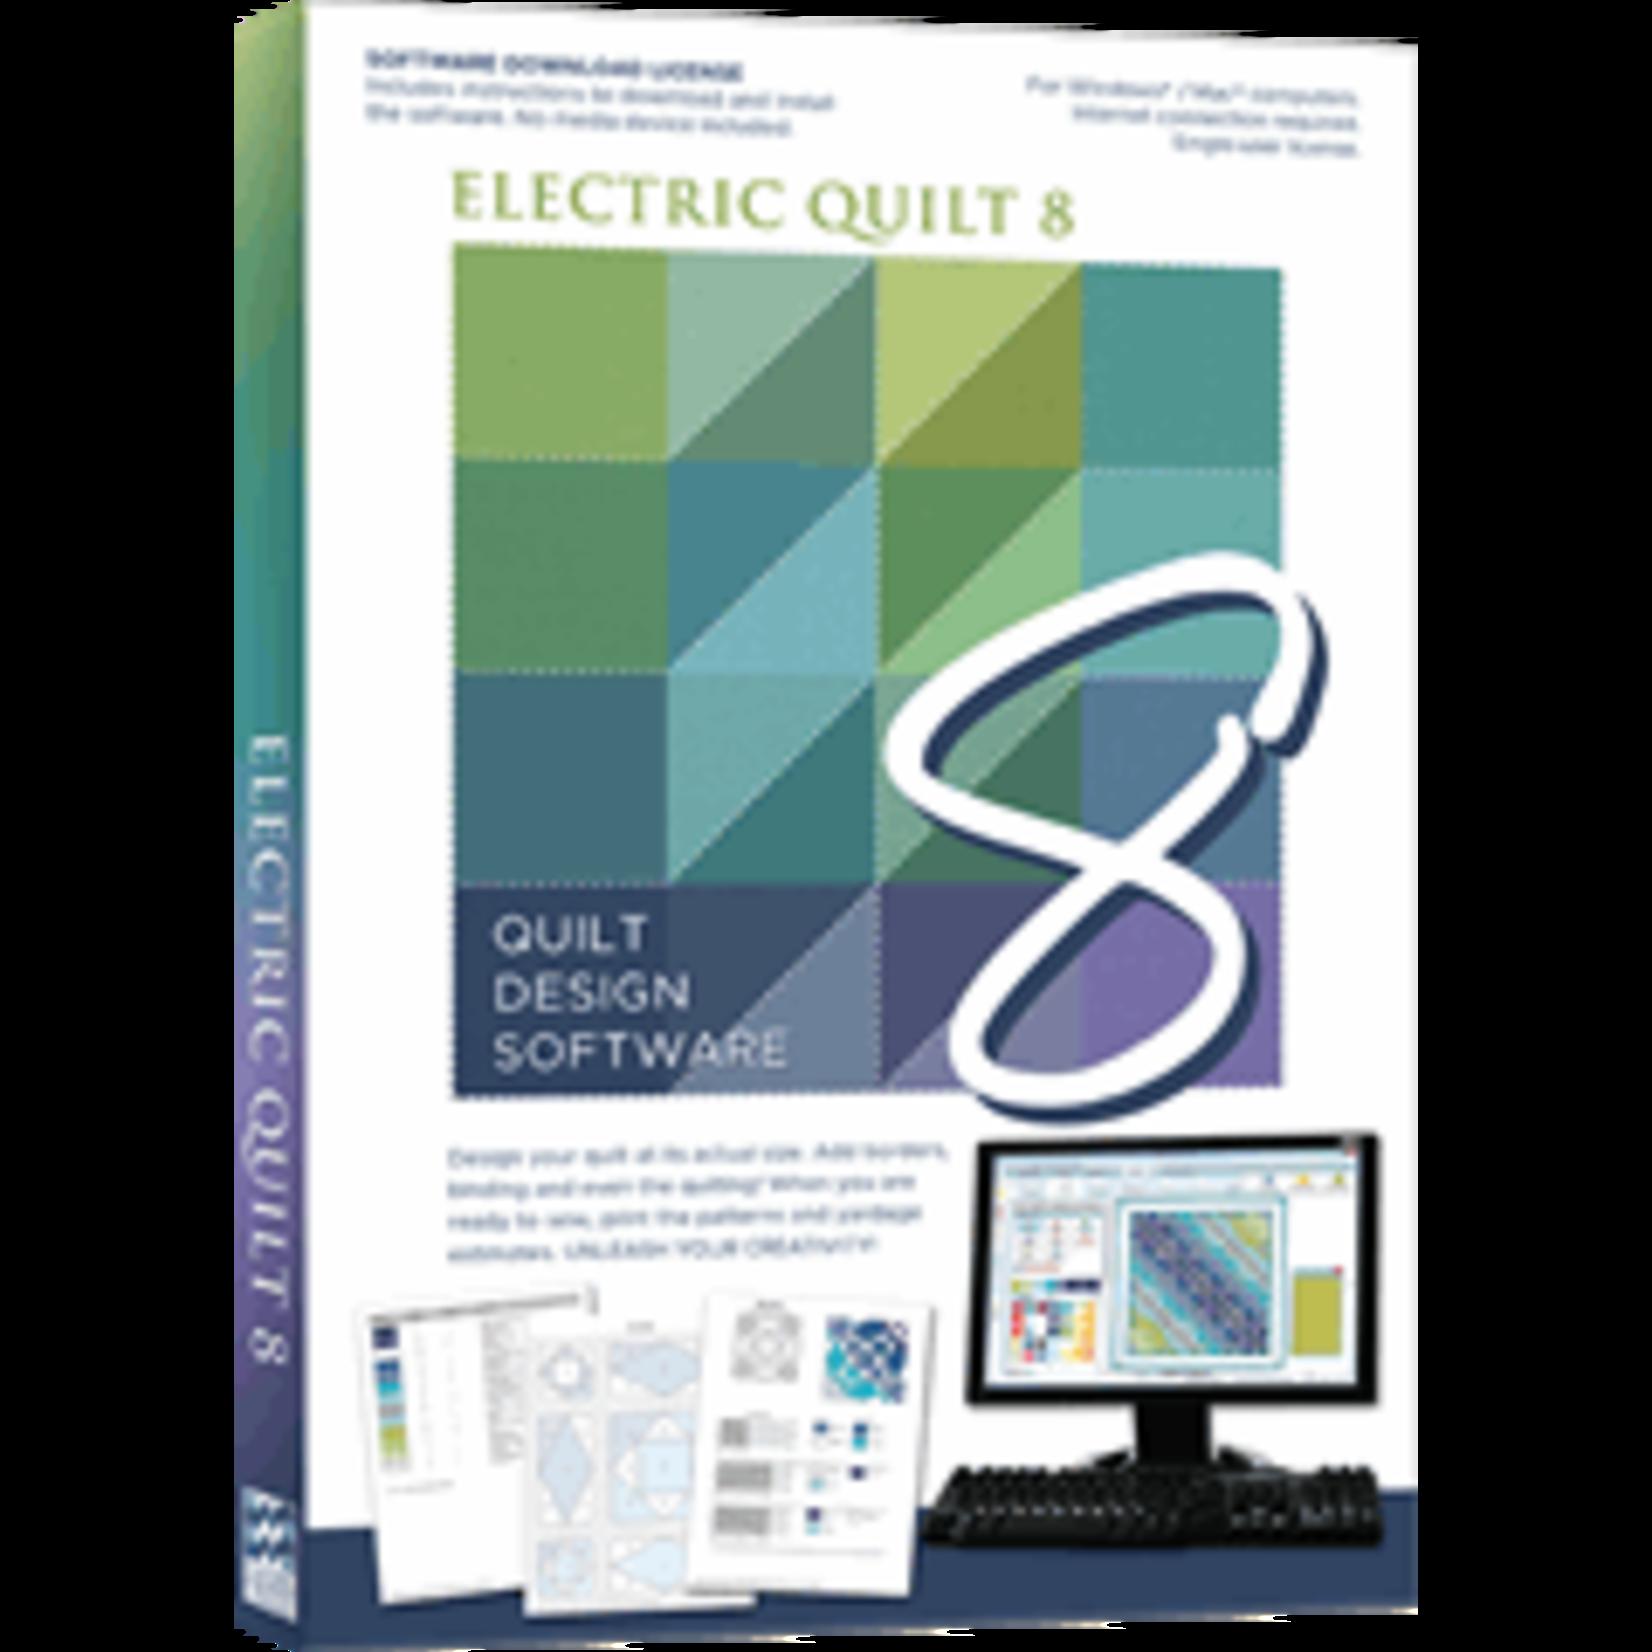 ELECTRIC QUILT COMPANY EQ 8- Electric Quilt Program